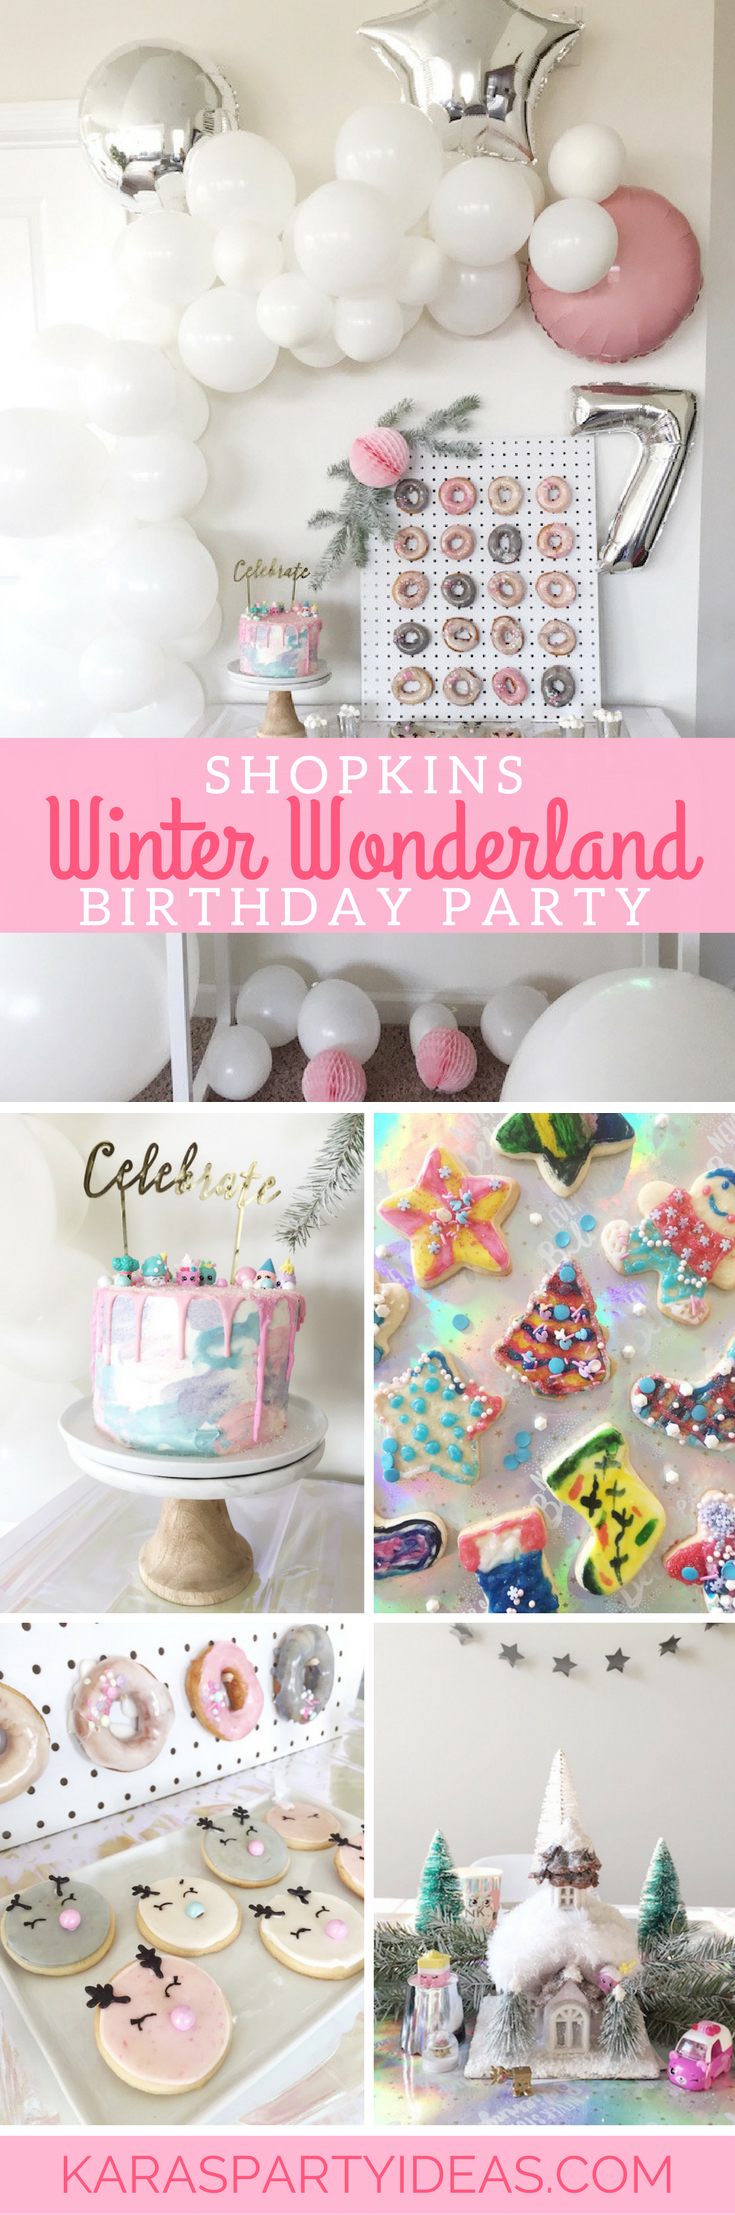 Shopkins Winter Wonderland Birthday Party via Kara's Party Ideas - KarasPartyIdeas.com